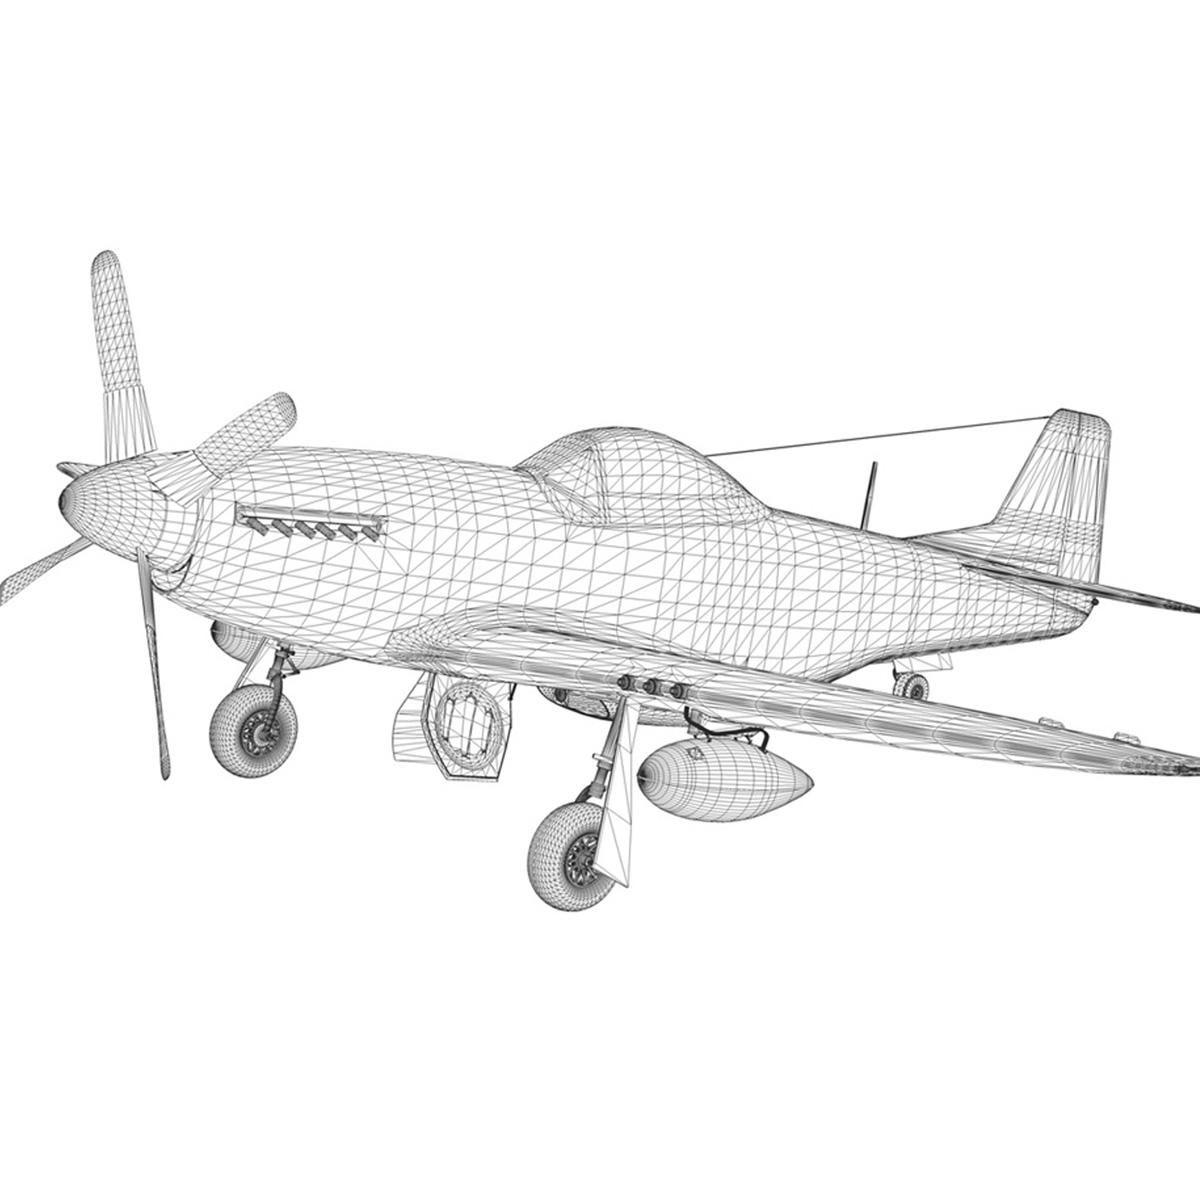 north american p-51d – mustang – miss velma 3d model 3ds fbx c4d lwo obj 267636